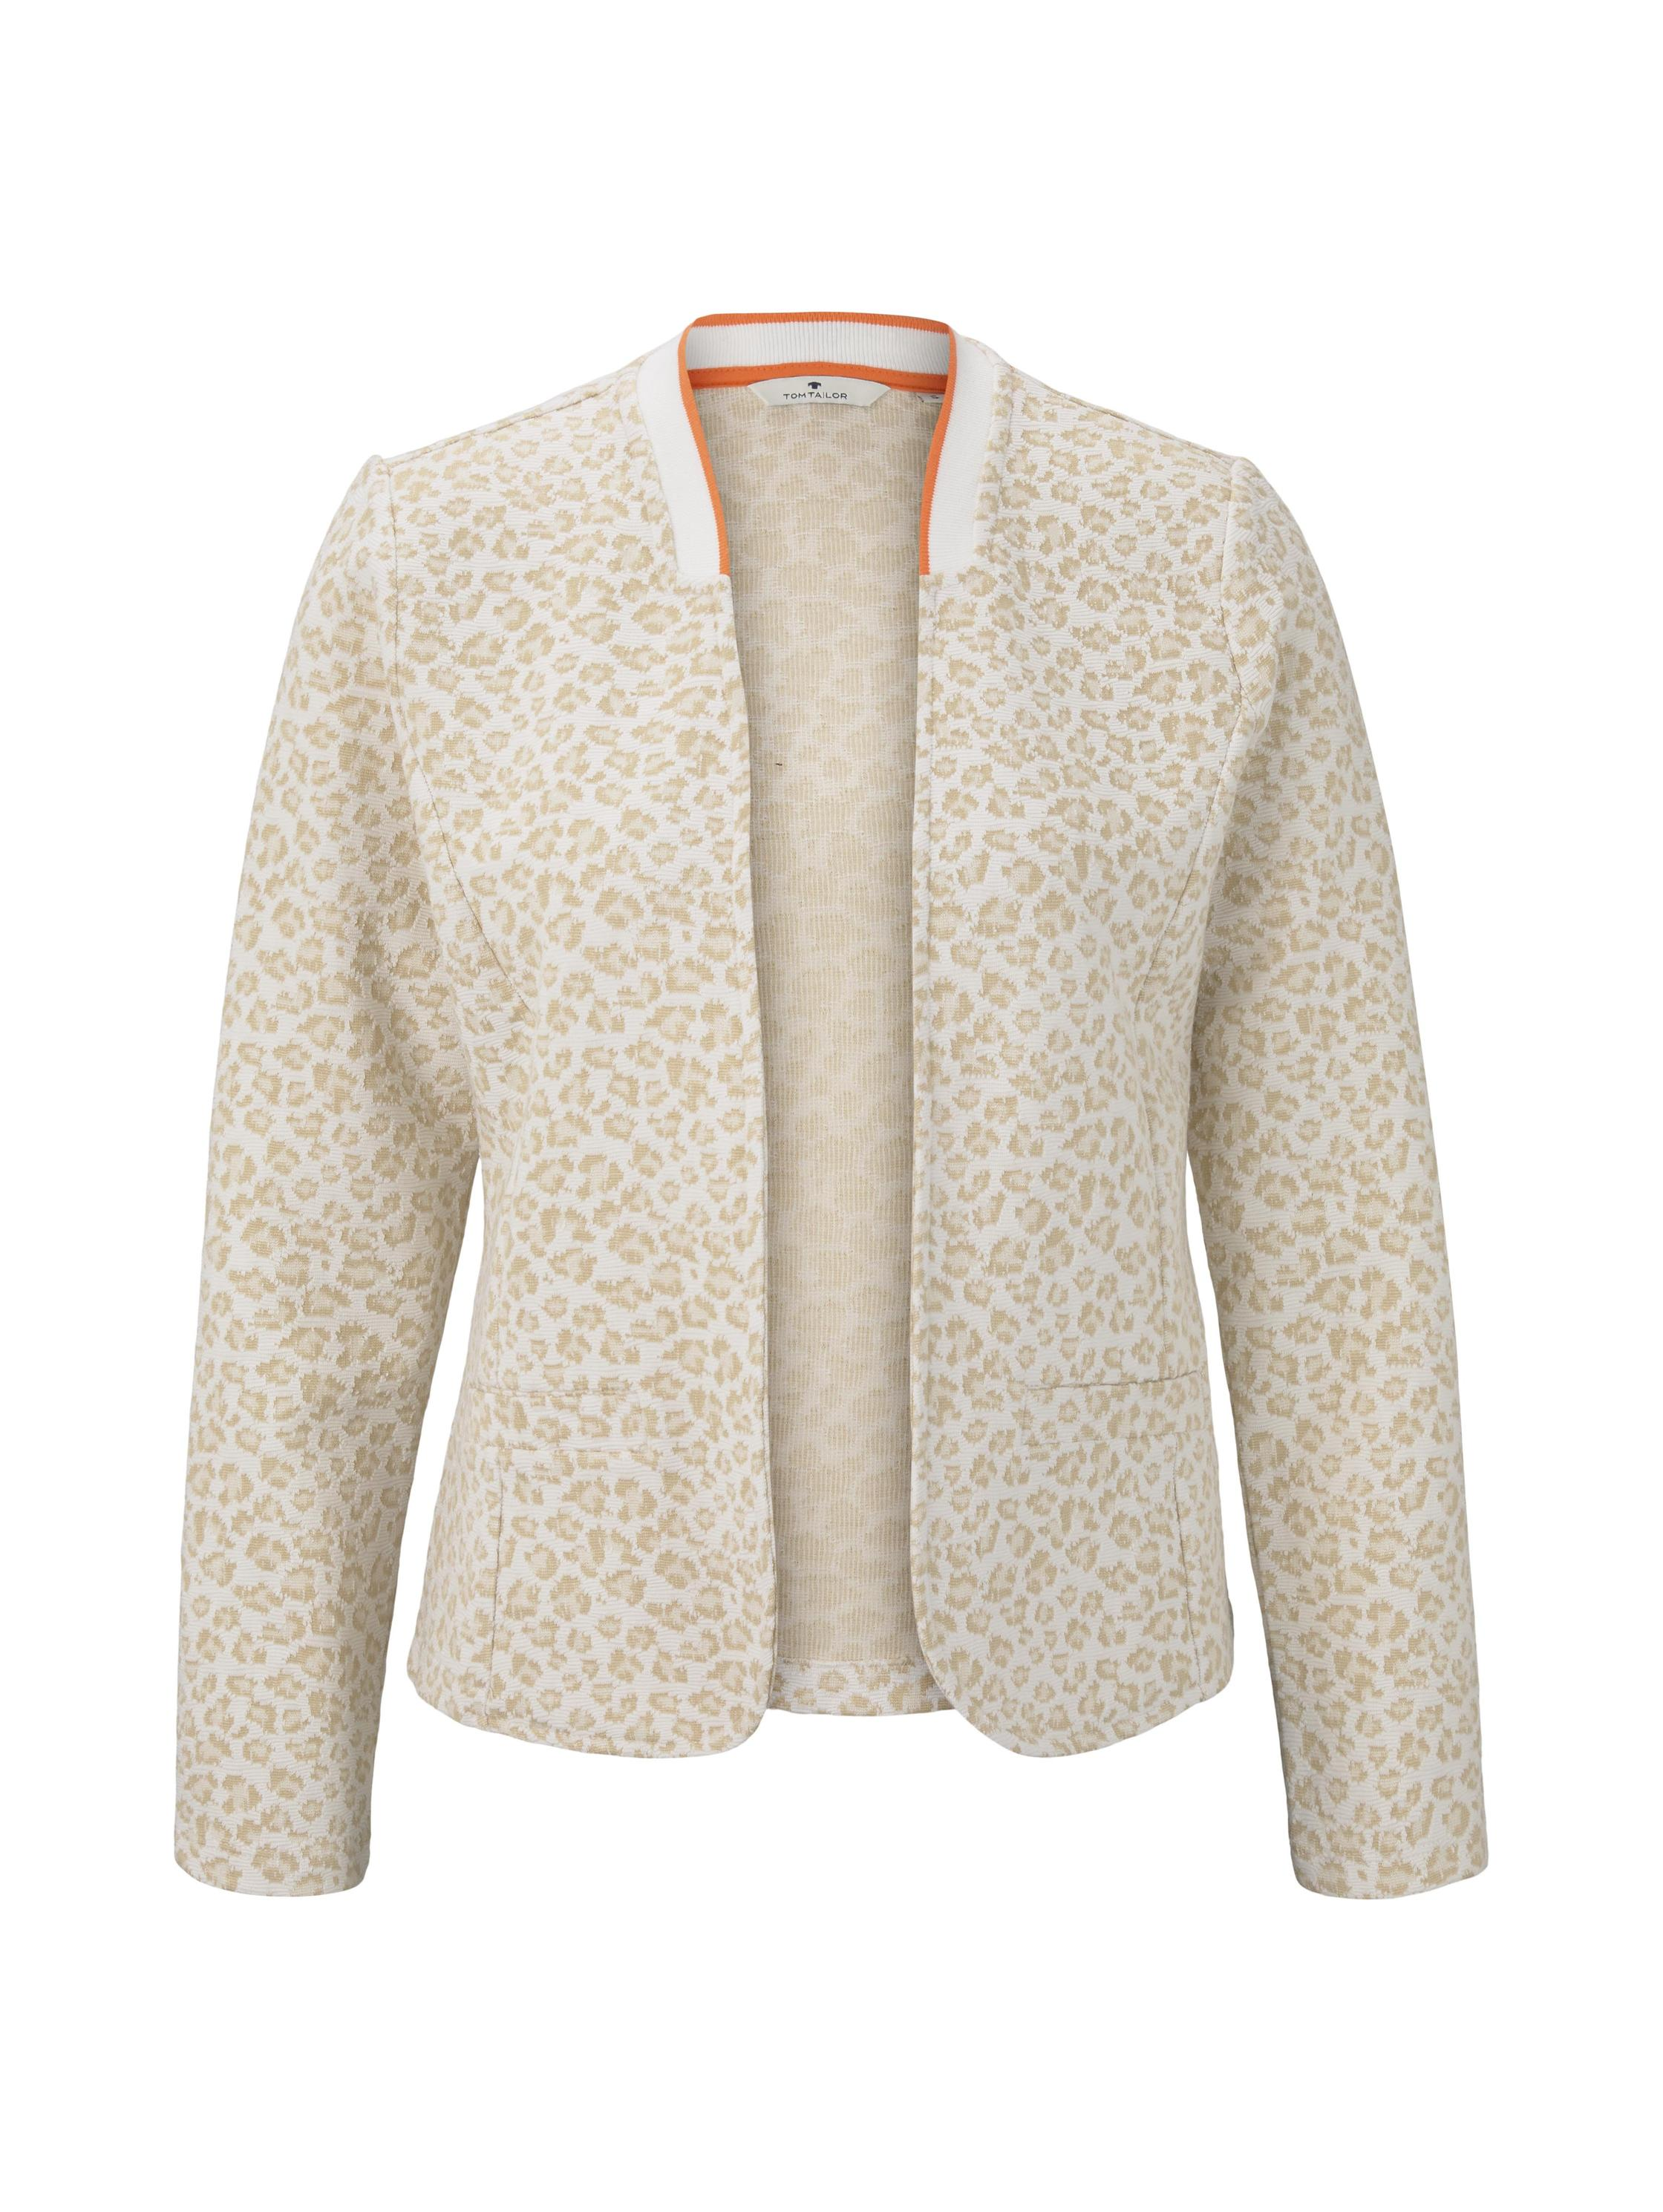 blazer jacket jacquard, beige leo jacquard